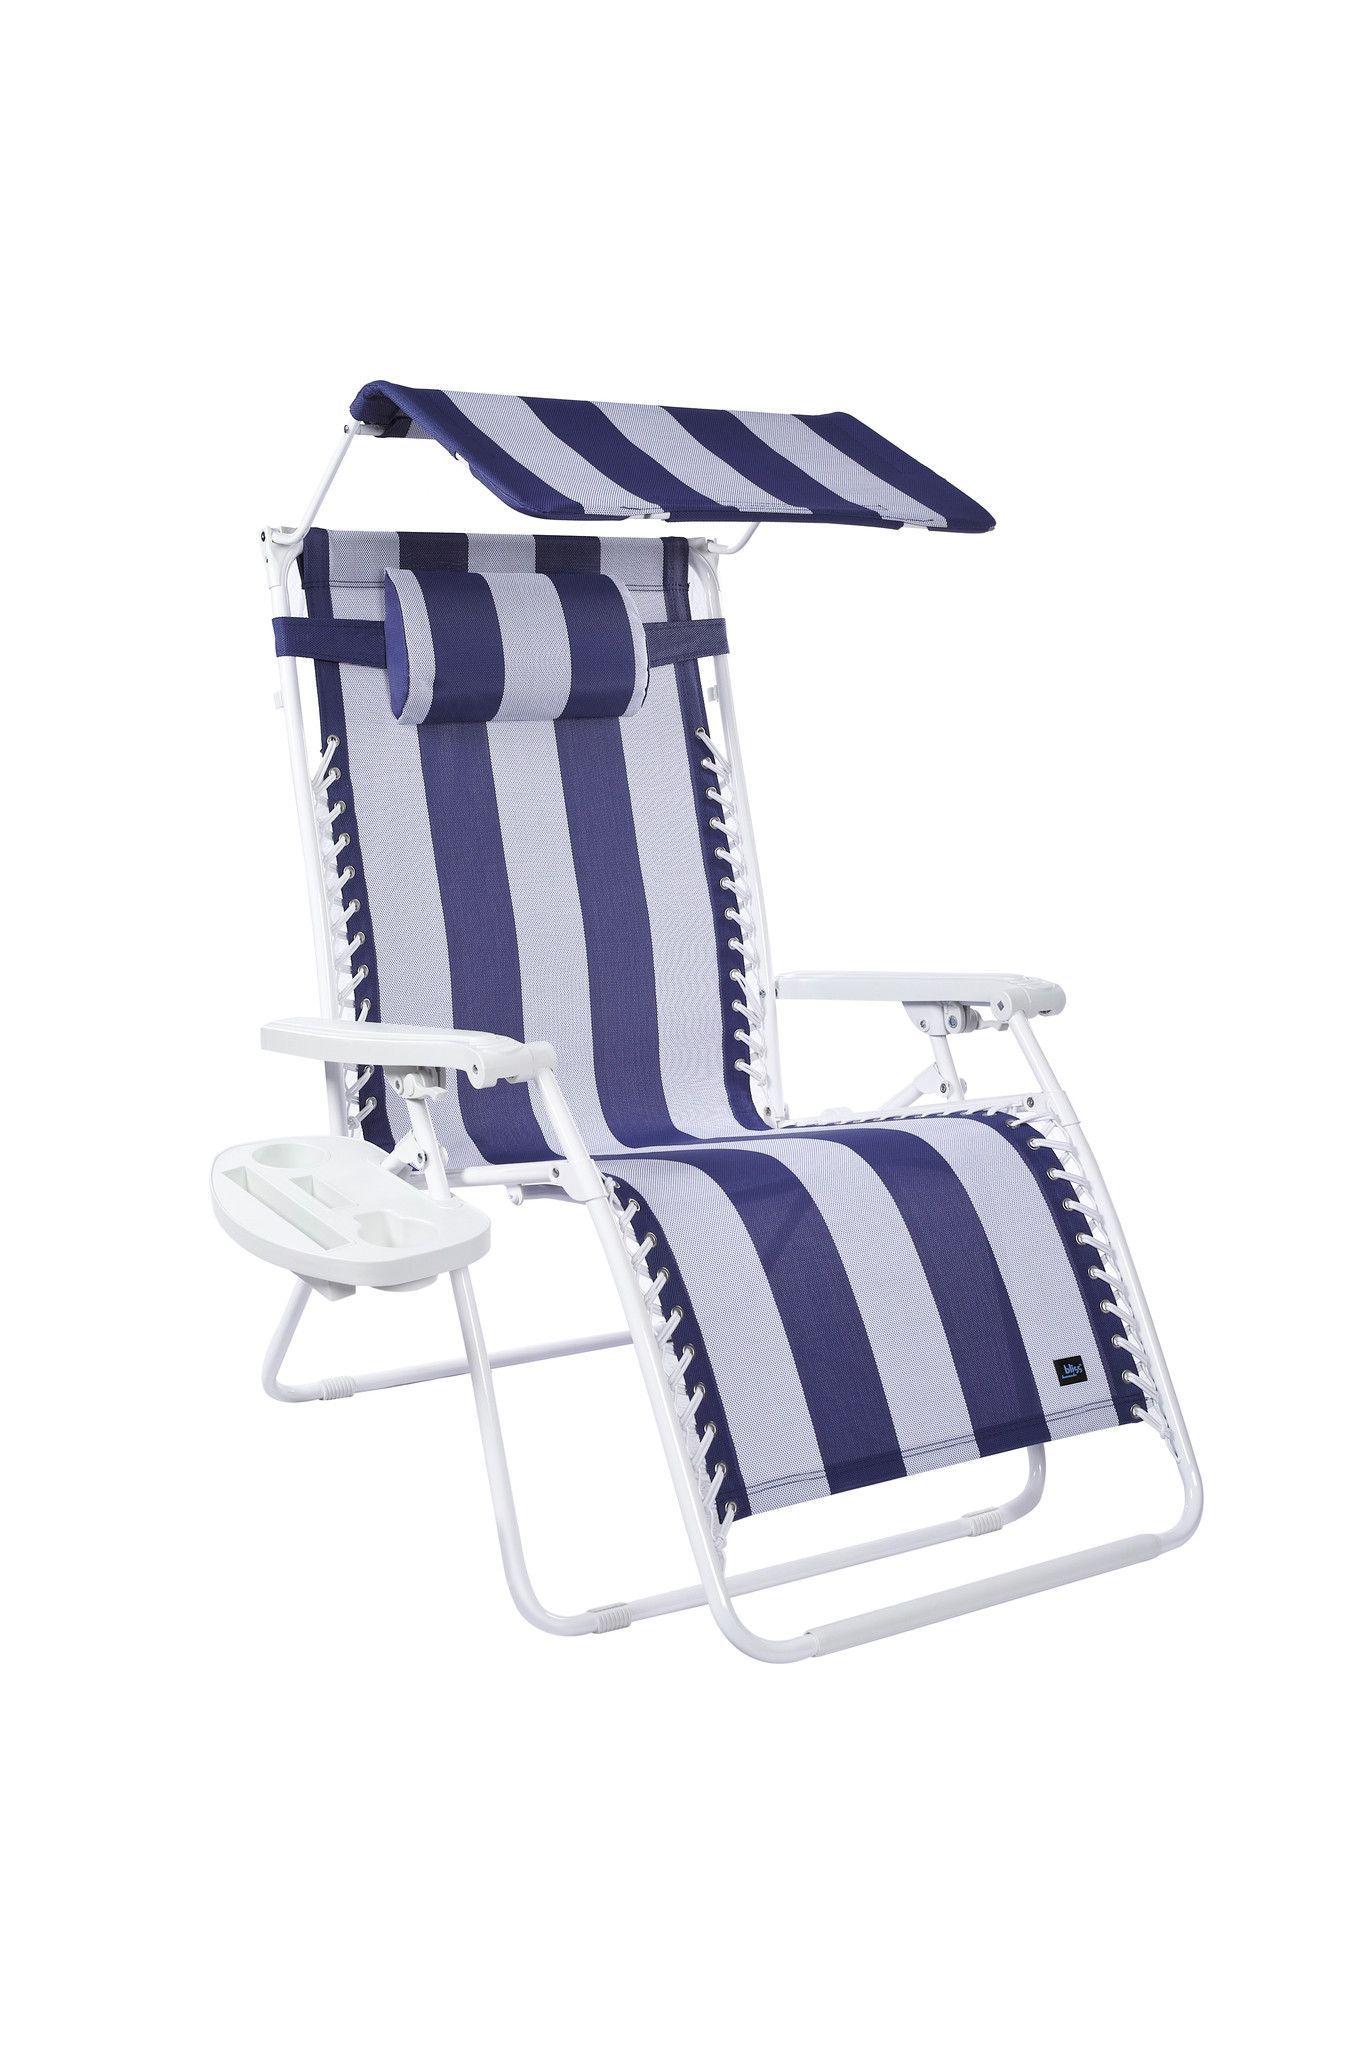 bliss hammocks xxl 33  recliner chairsreclinerscanopyblue and white hammockscupstrayzero bliss hammocks xxl 33   products stripes and trays  rh   pinterest